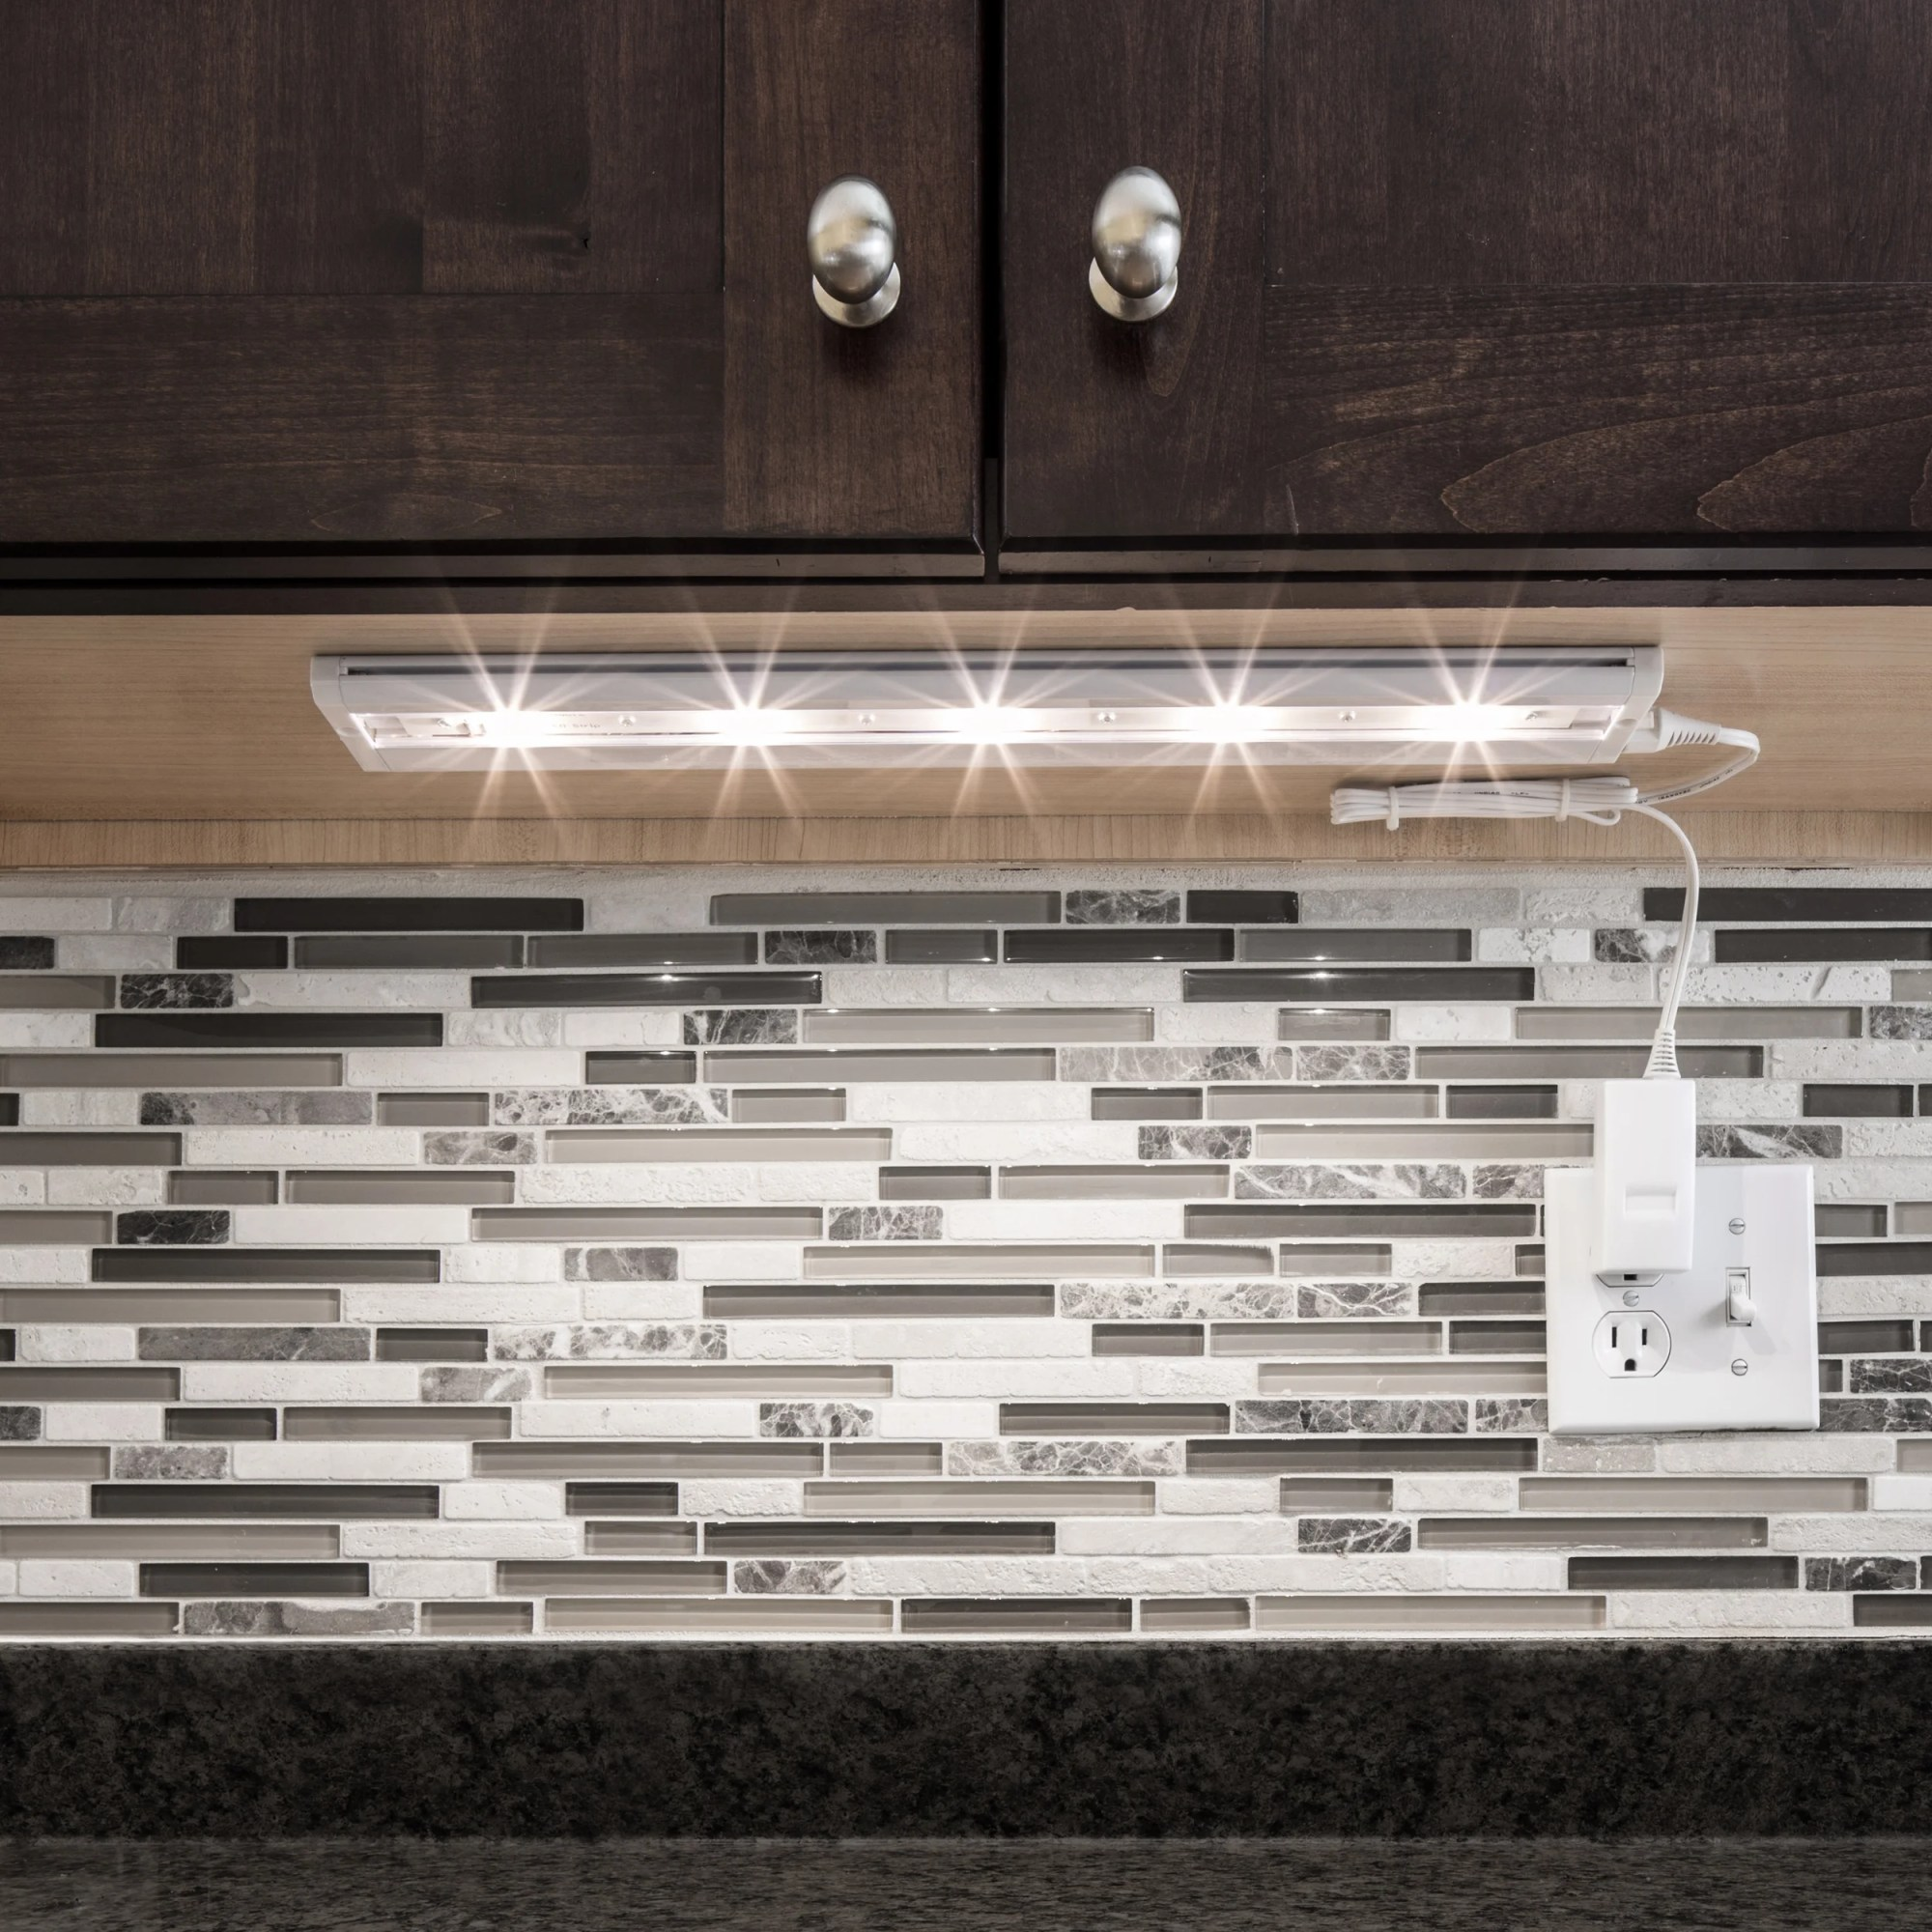 hight resolution of under cabinet lights